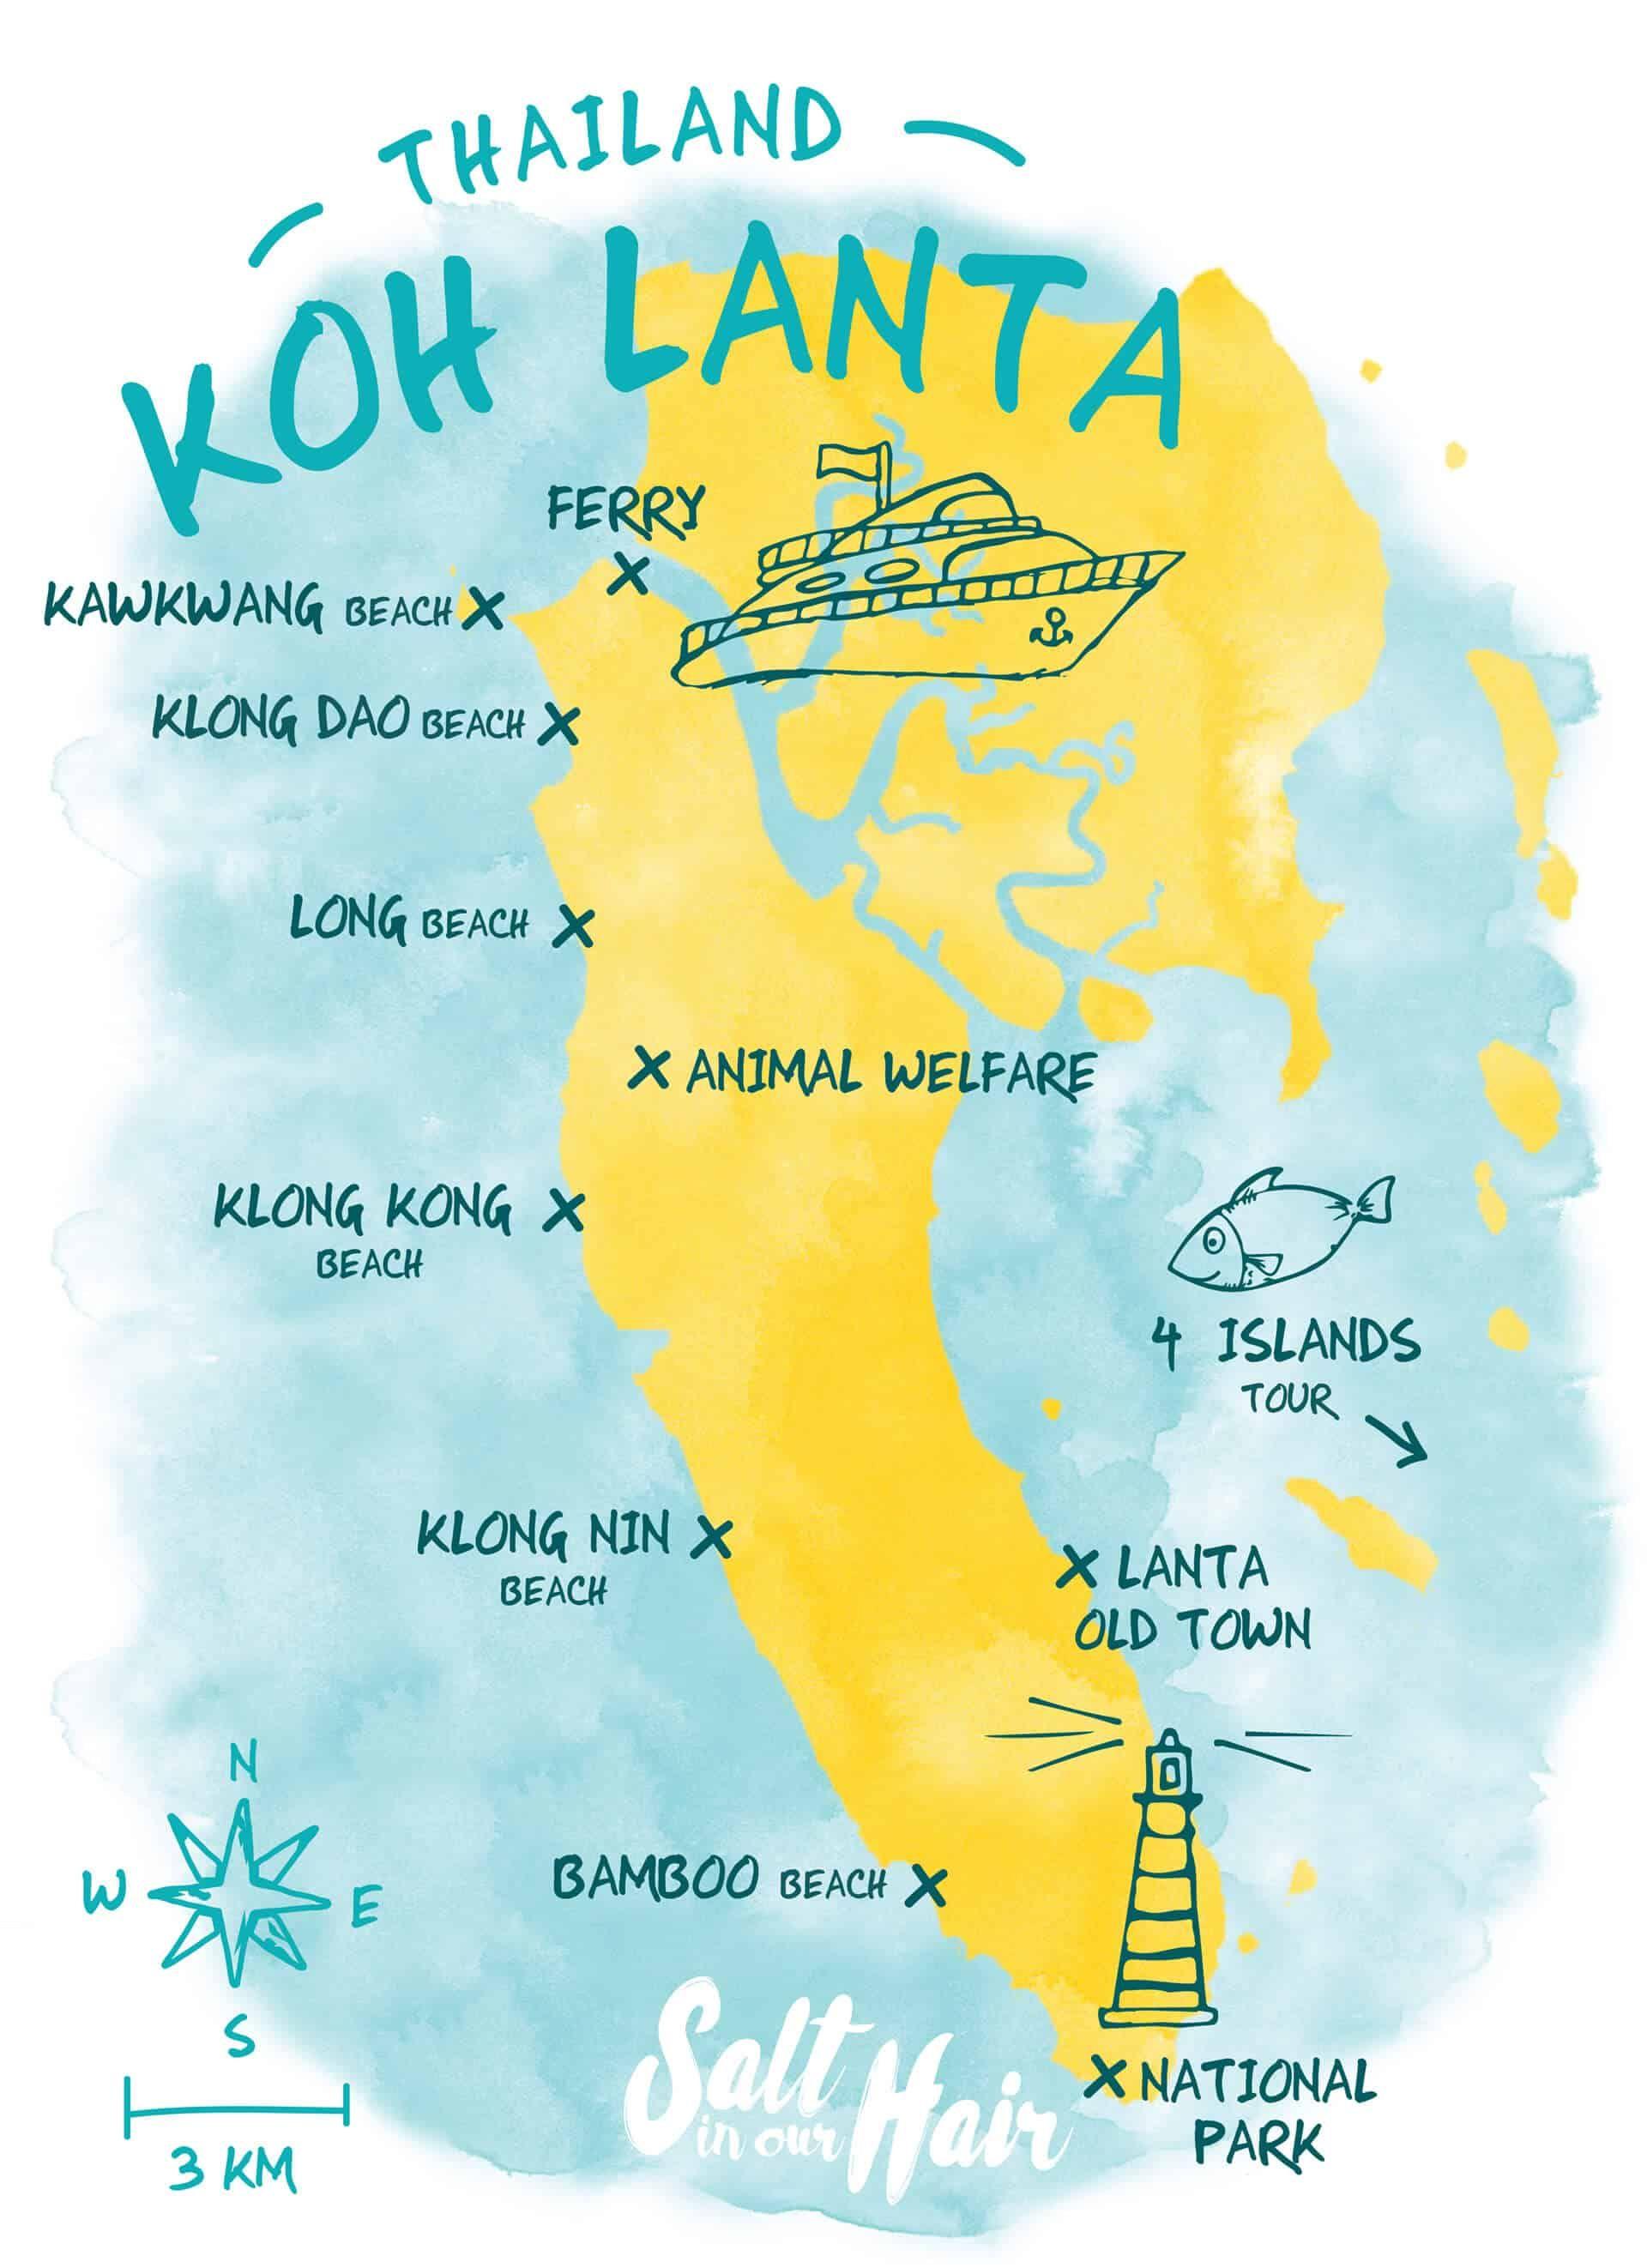 KOH LANTA BEACHES Thailand travel, Thailand adventure